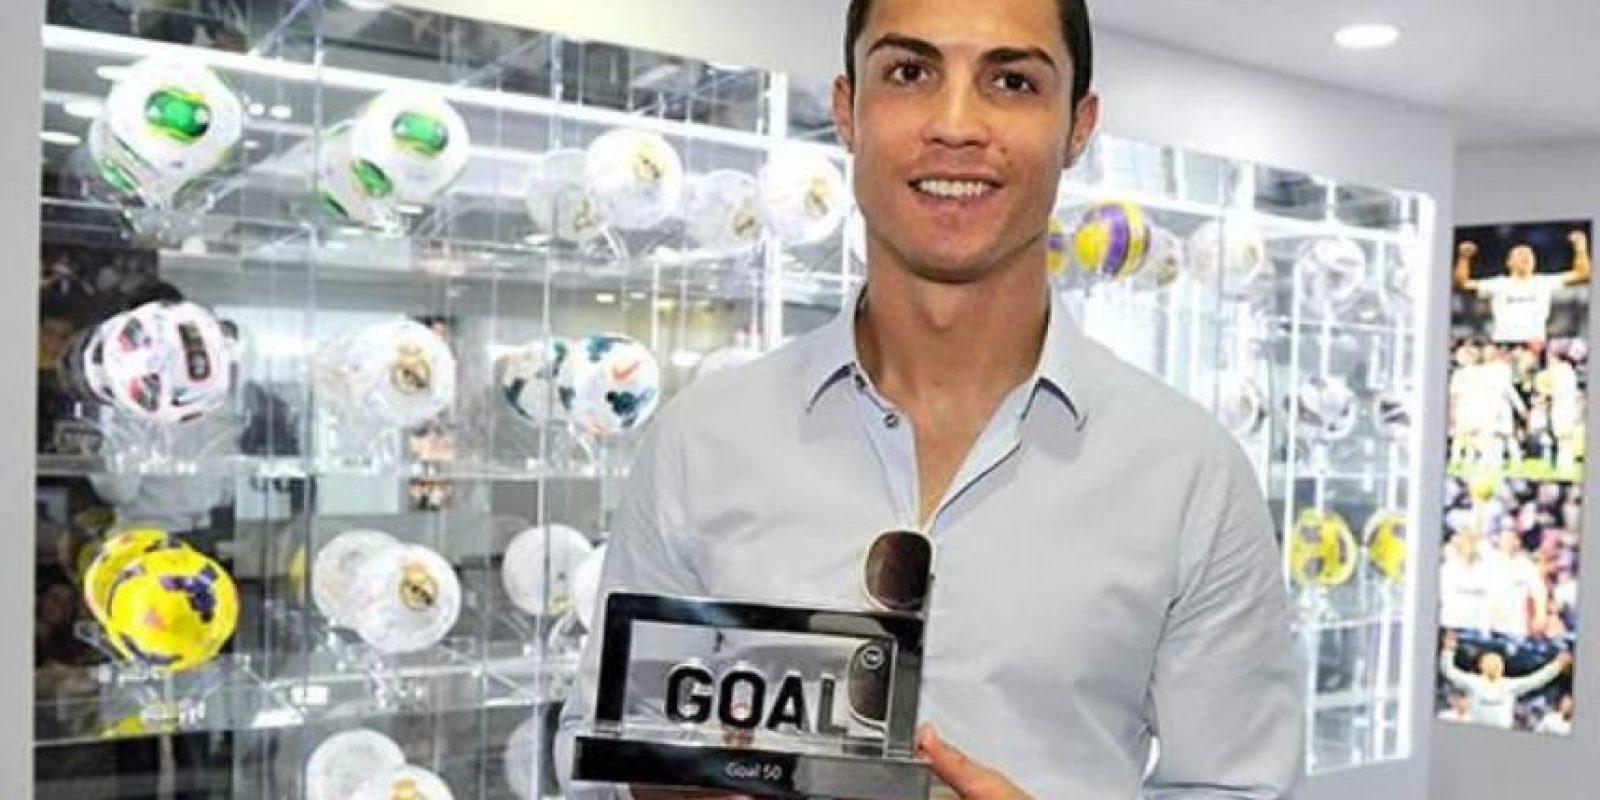 Cristiano Ronaldo con su trofeo Goal 50. Foto:twitter.com/GoalEspana